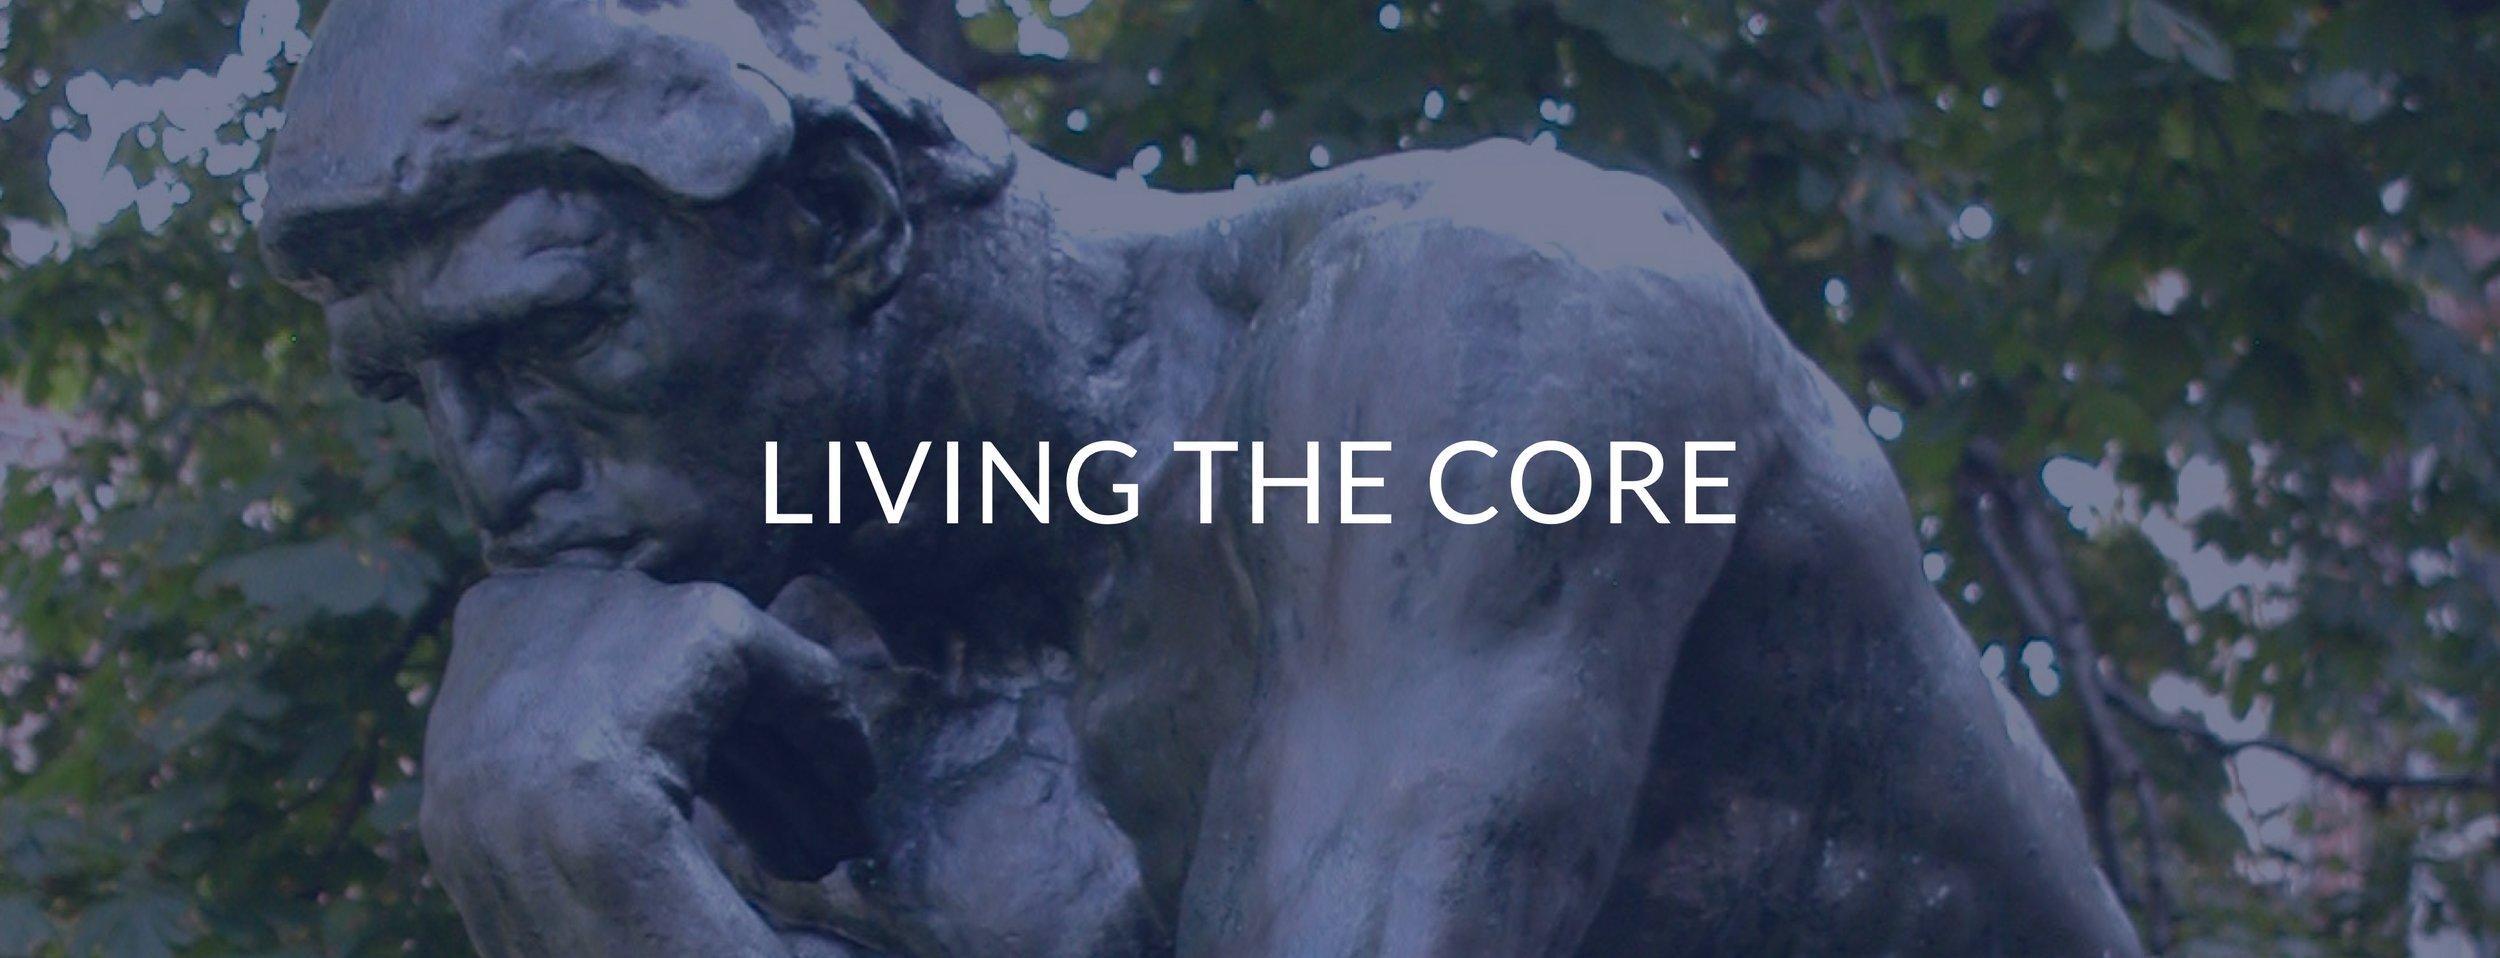 living the core.jpg